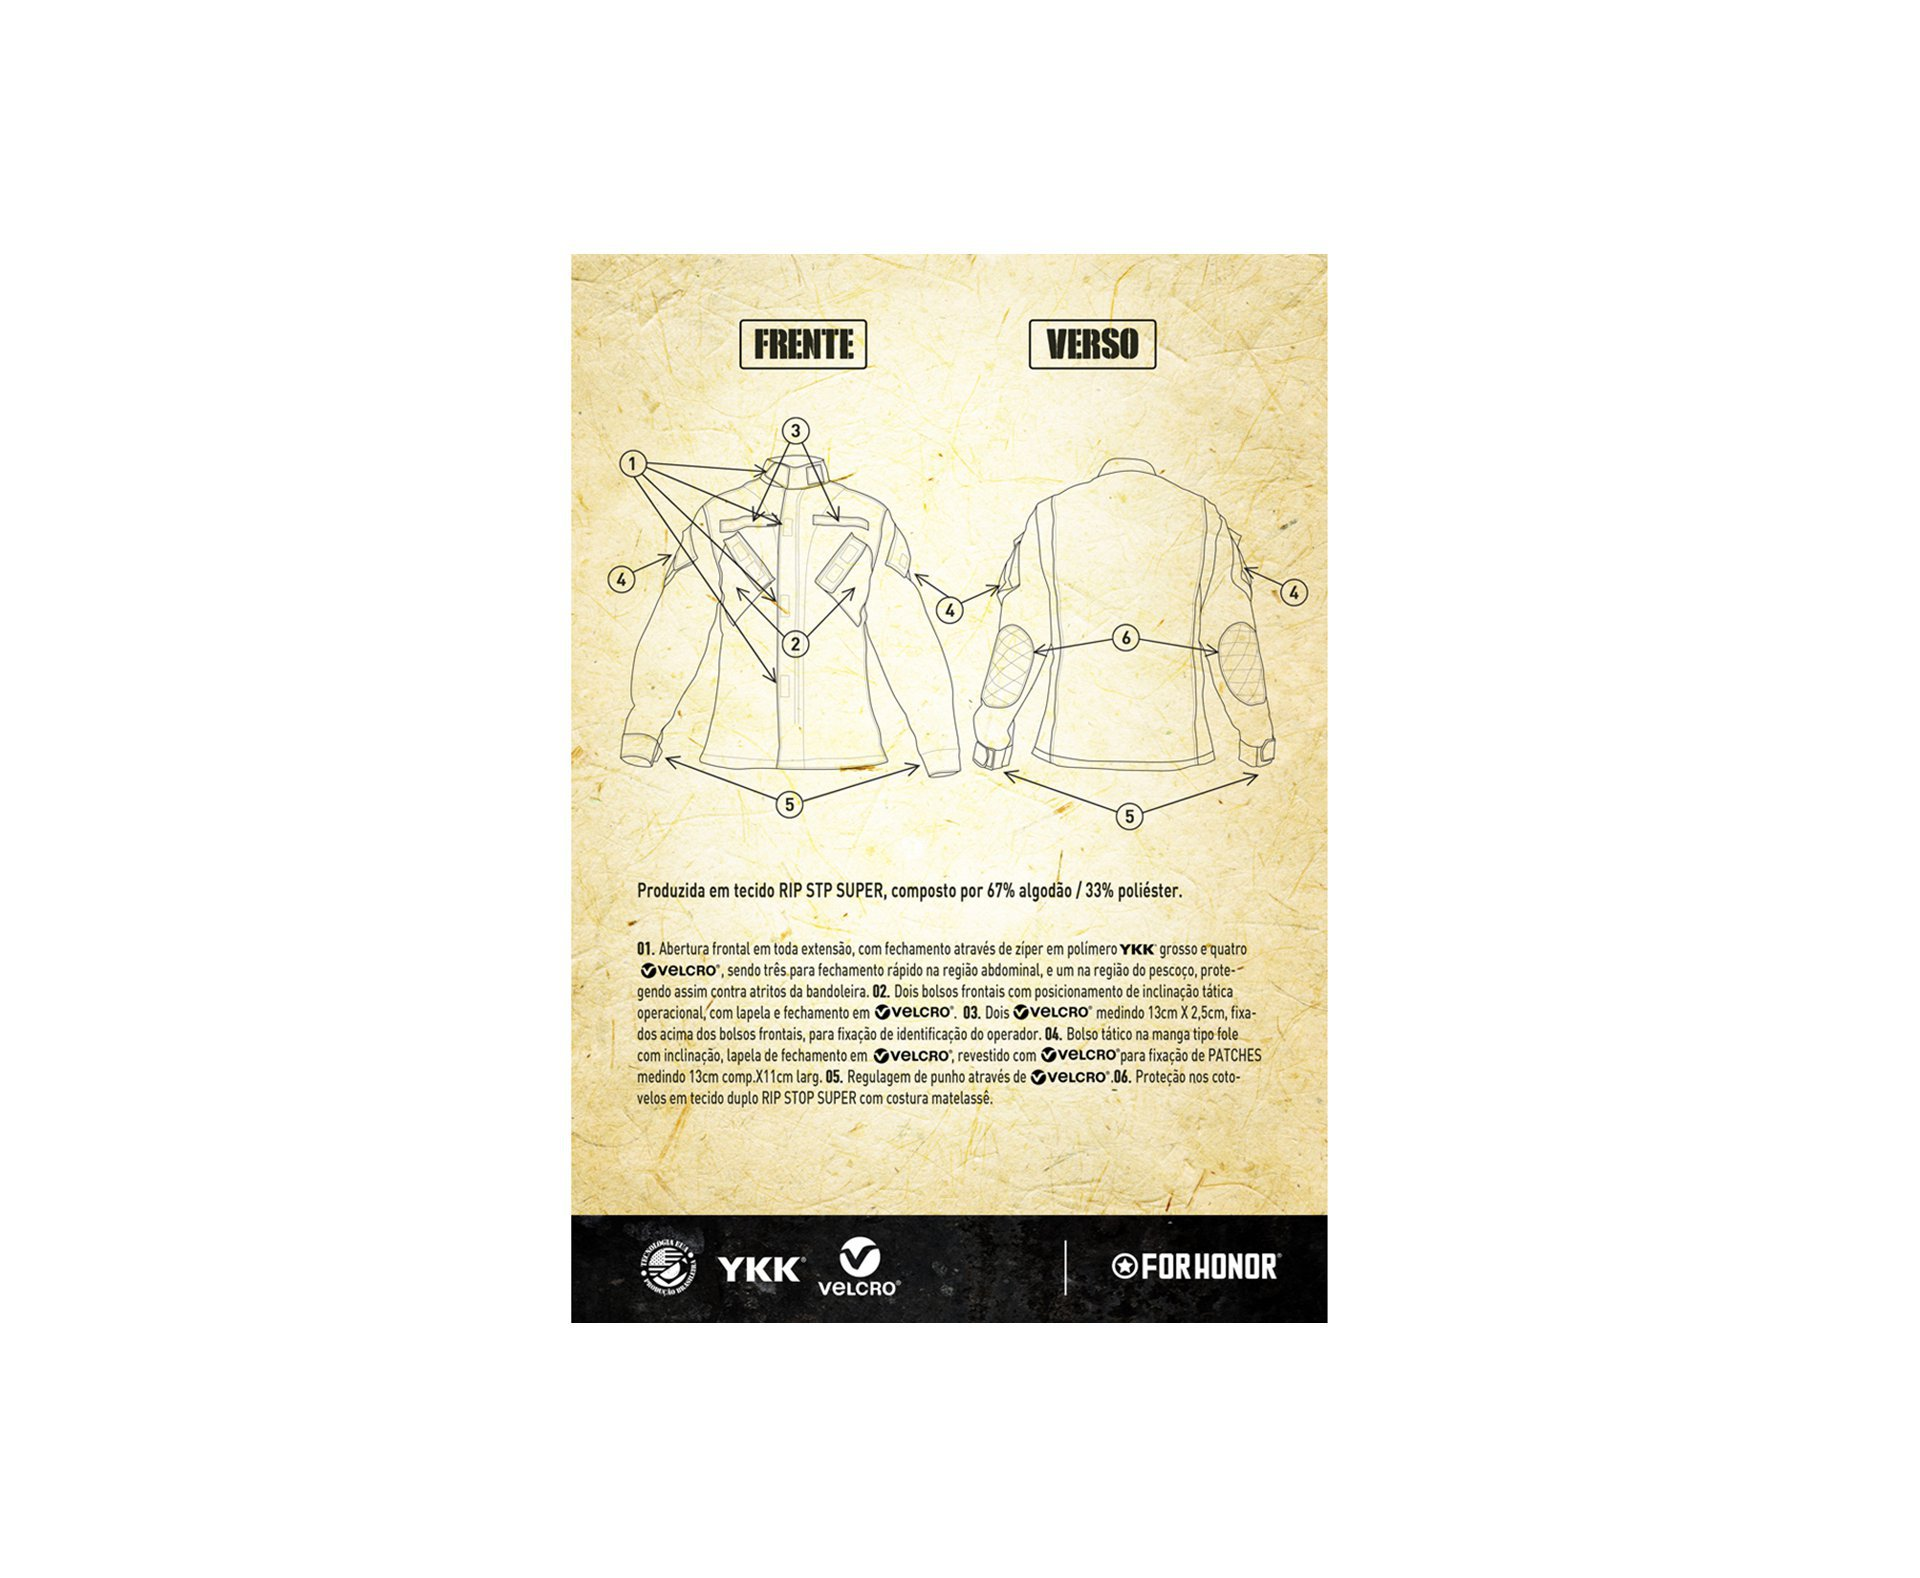 Gandola Tatica 811 Olive Drab - Forhonor - P